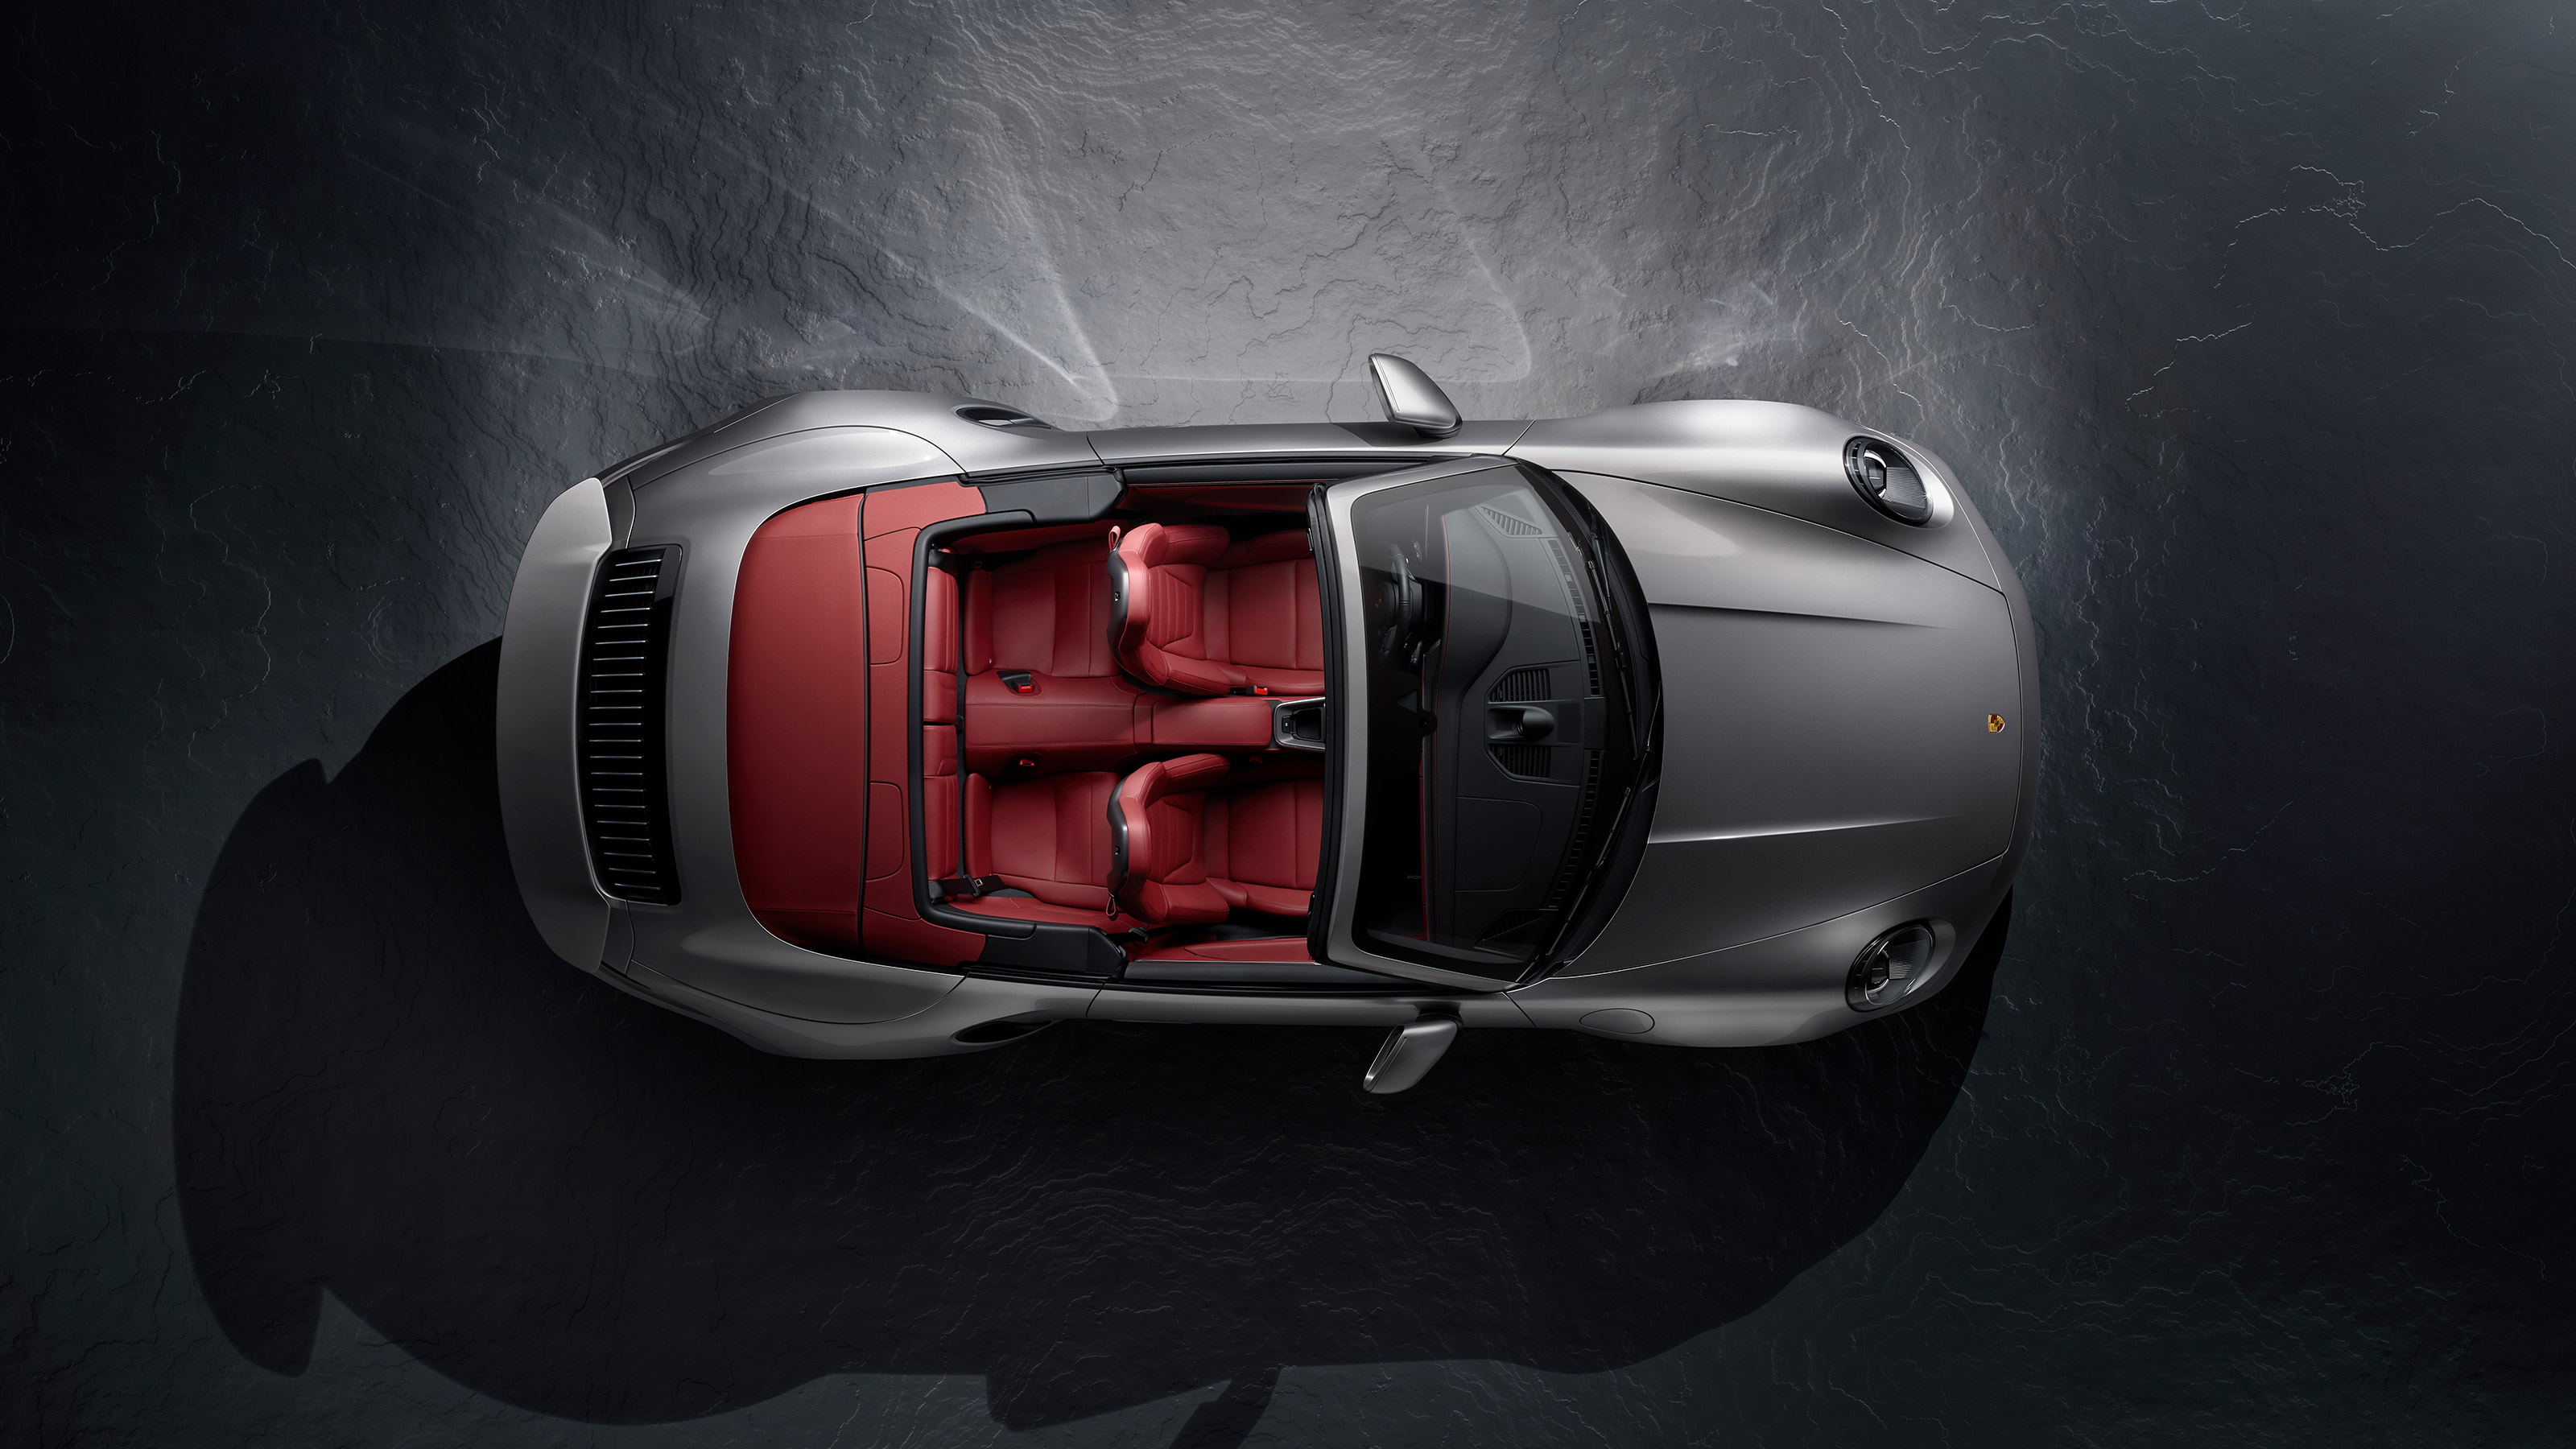 911 Turbo S Cabriolet